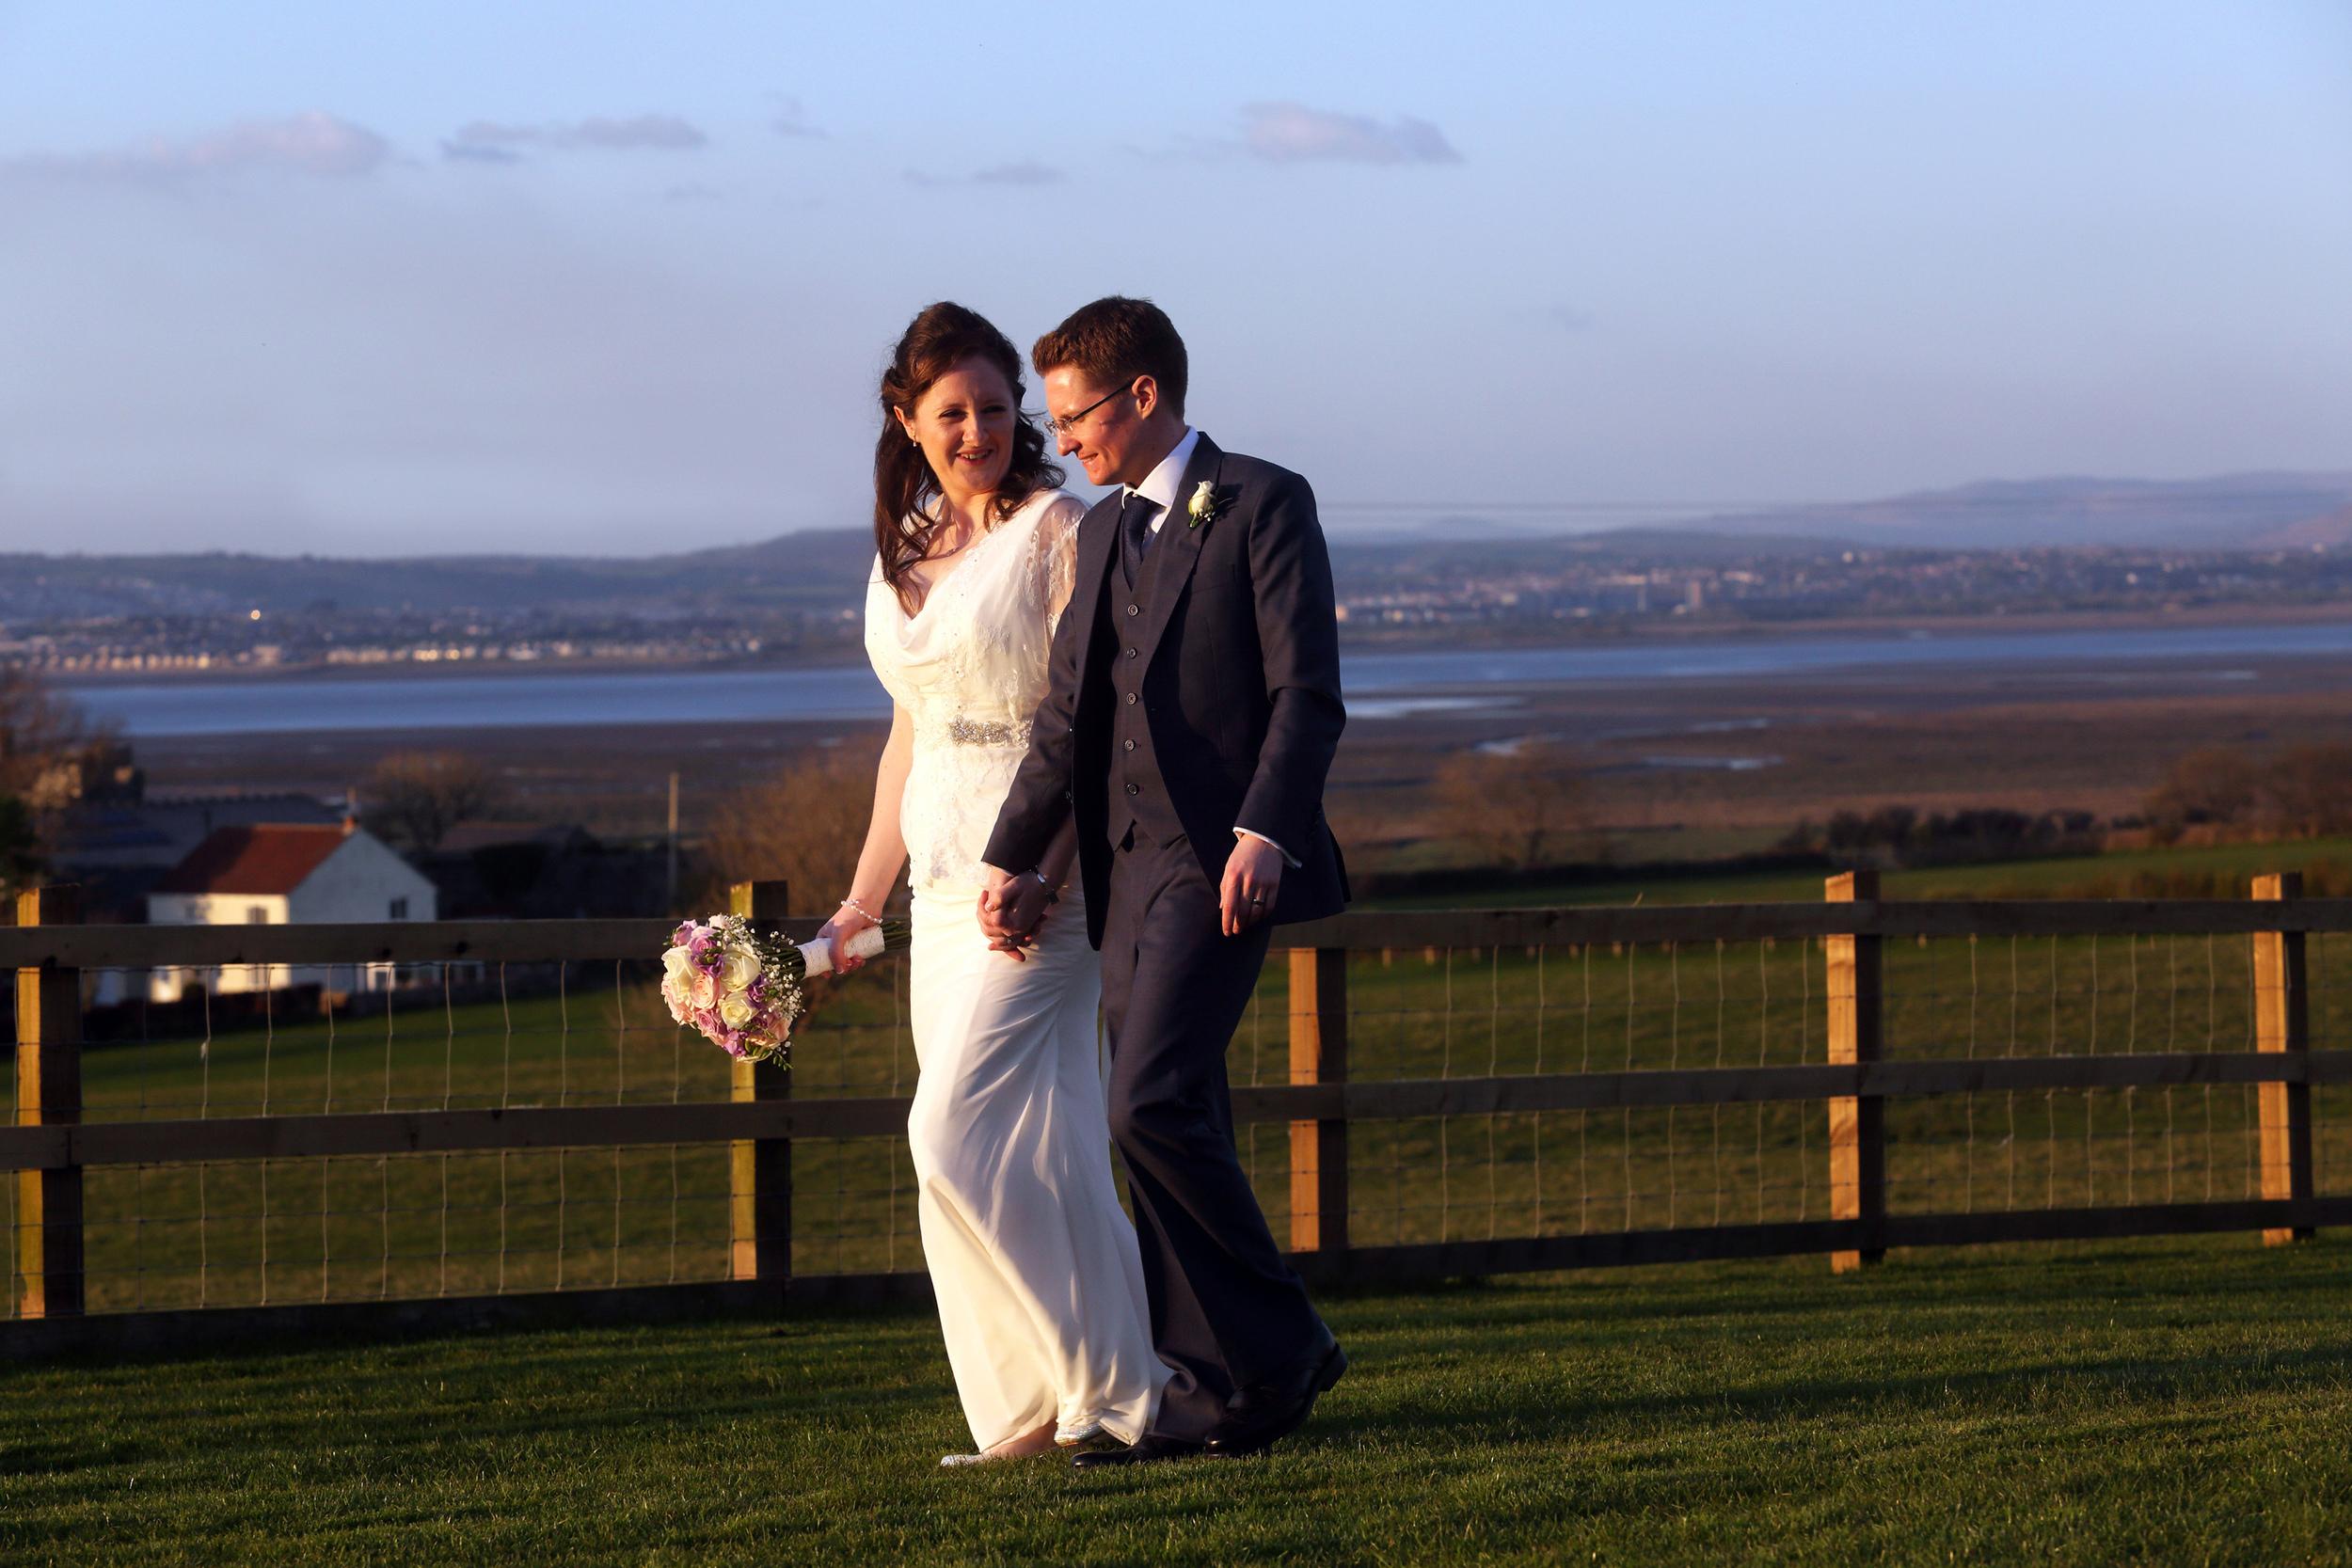 Ocean-View-Gower-Wedding-Photographer-067.JPG